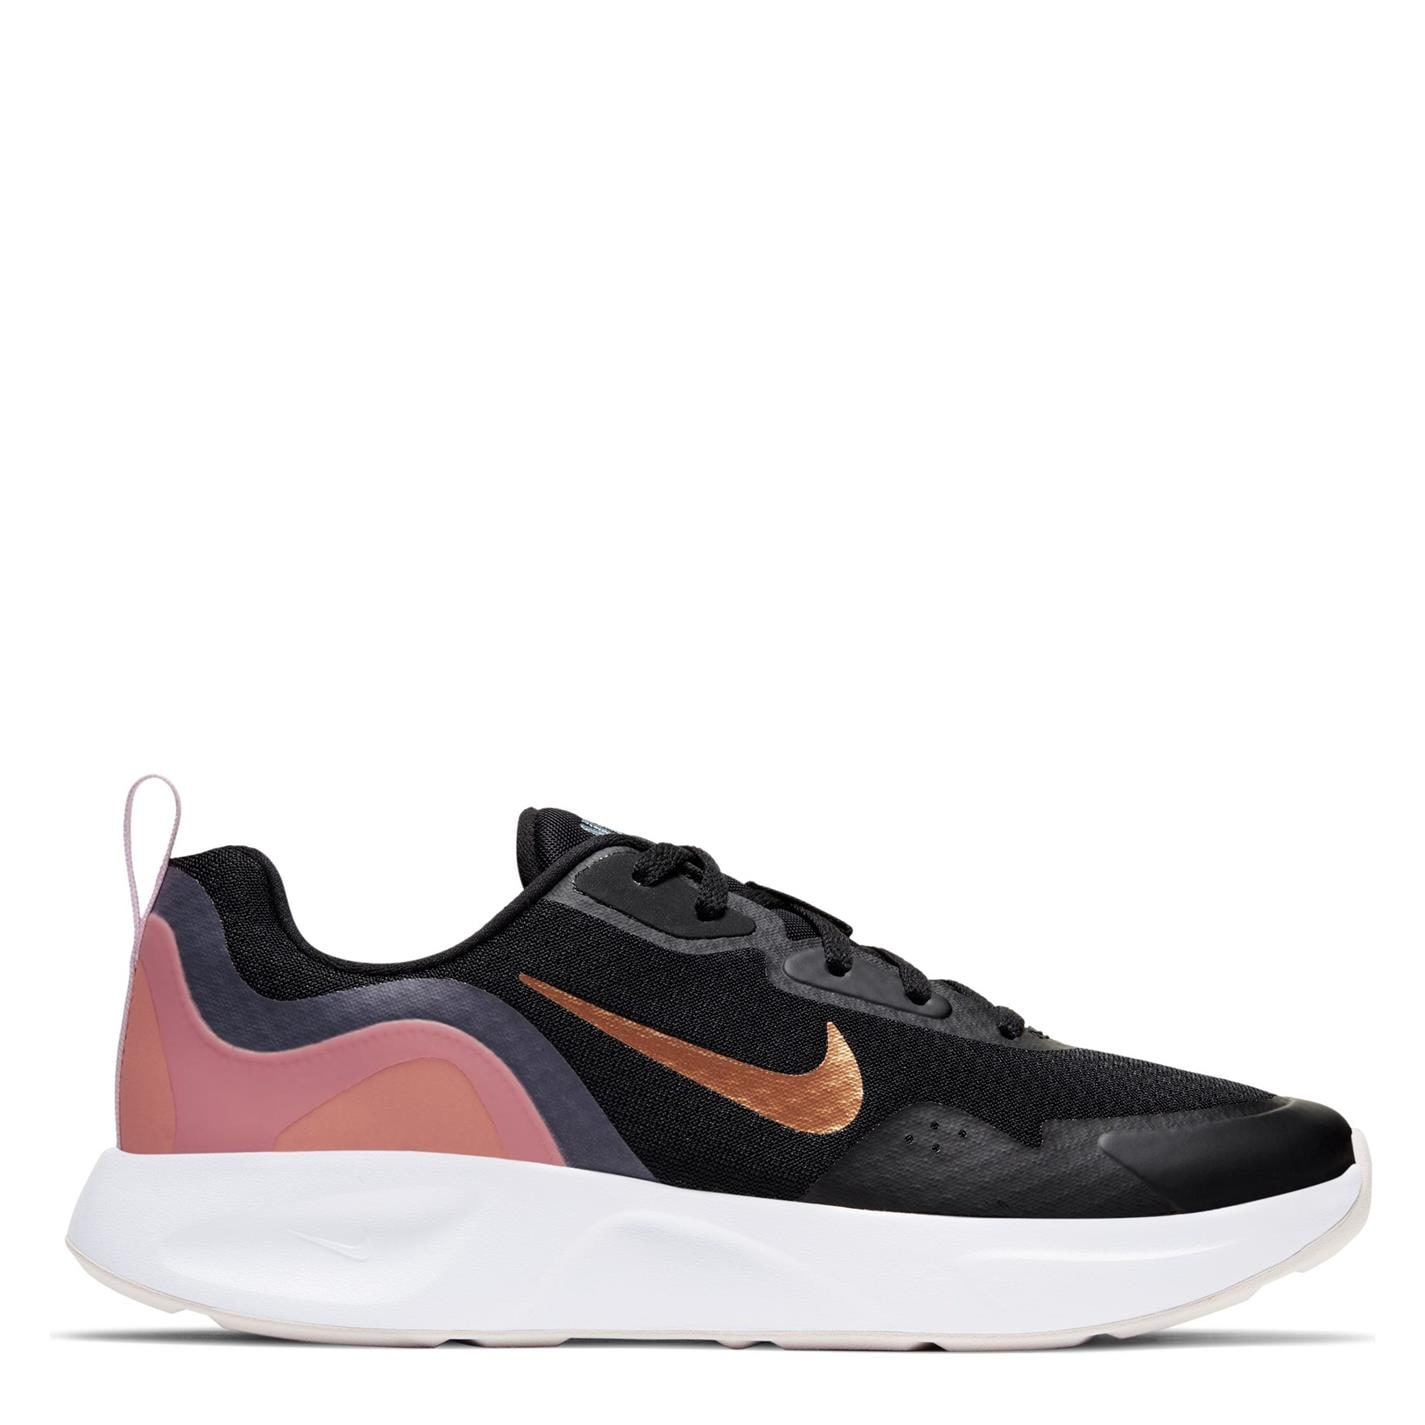 Adidasi sport Nike Wearallday pentru femei negru met roz